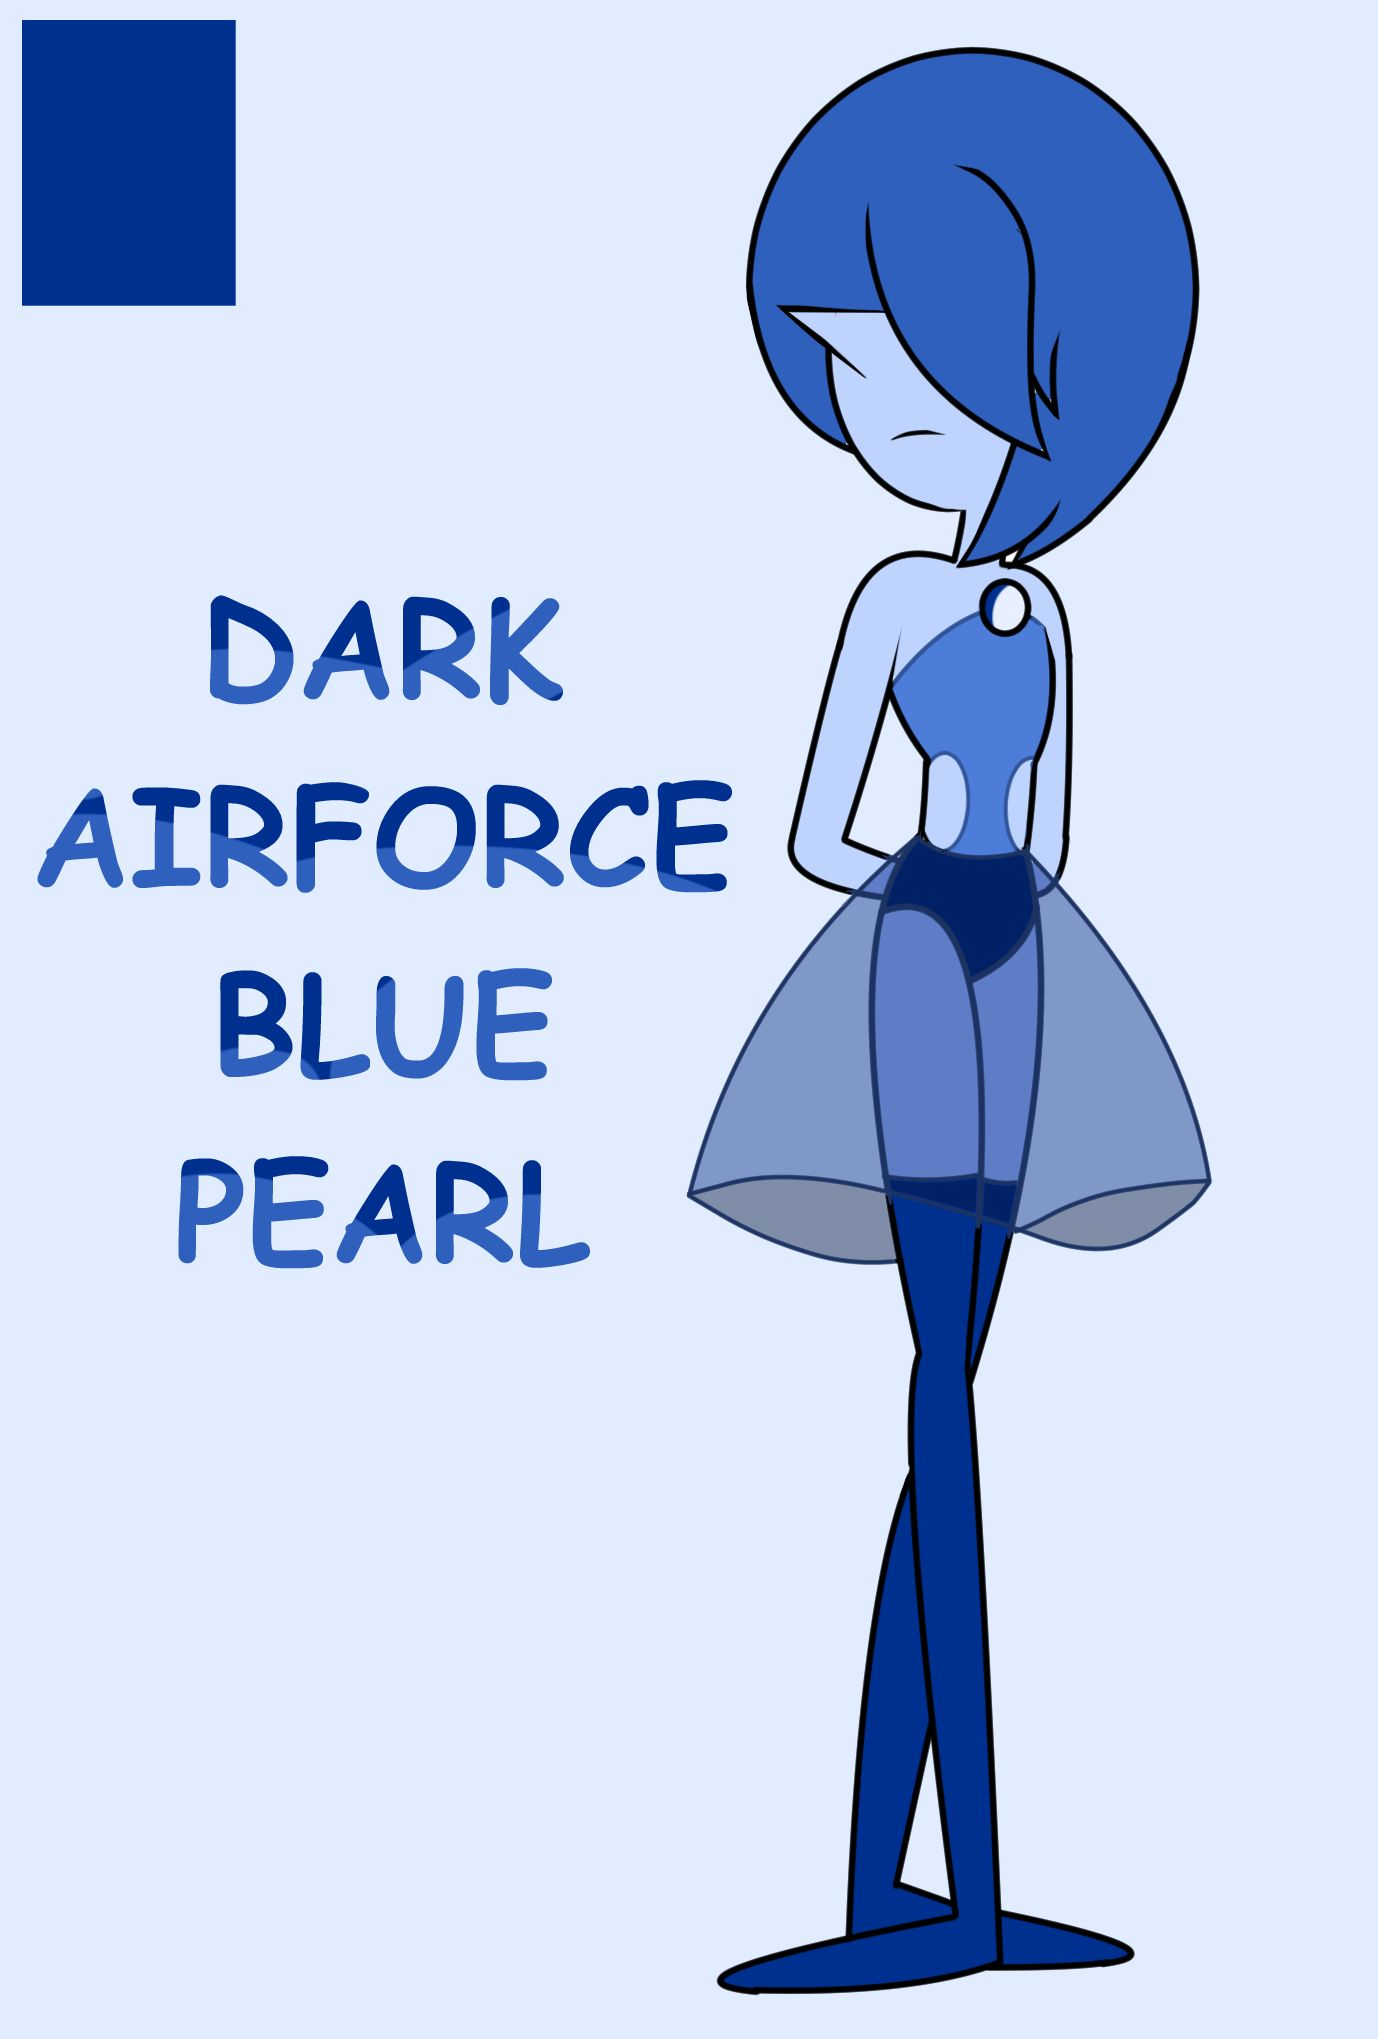 Dark Airforce Blue Pearl   #StevenUniverse #su #pearl